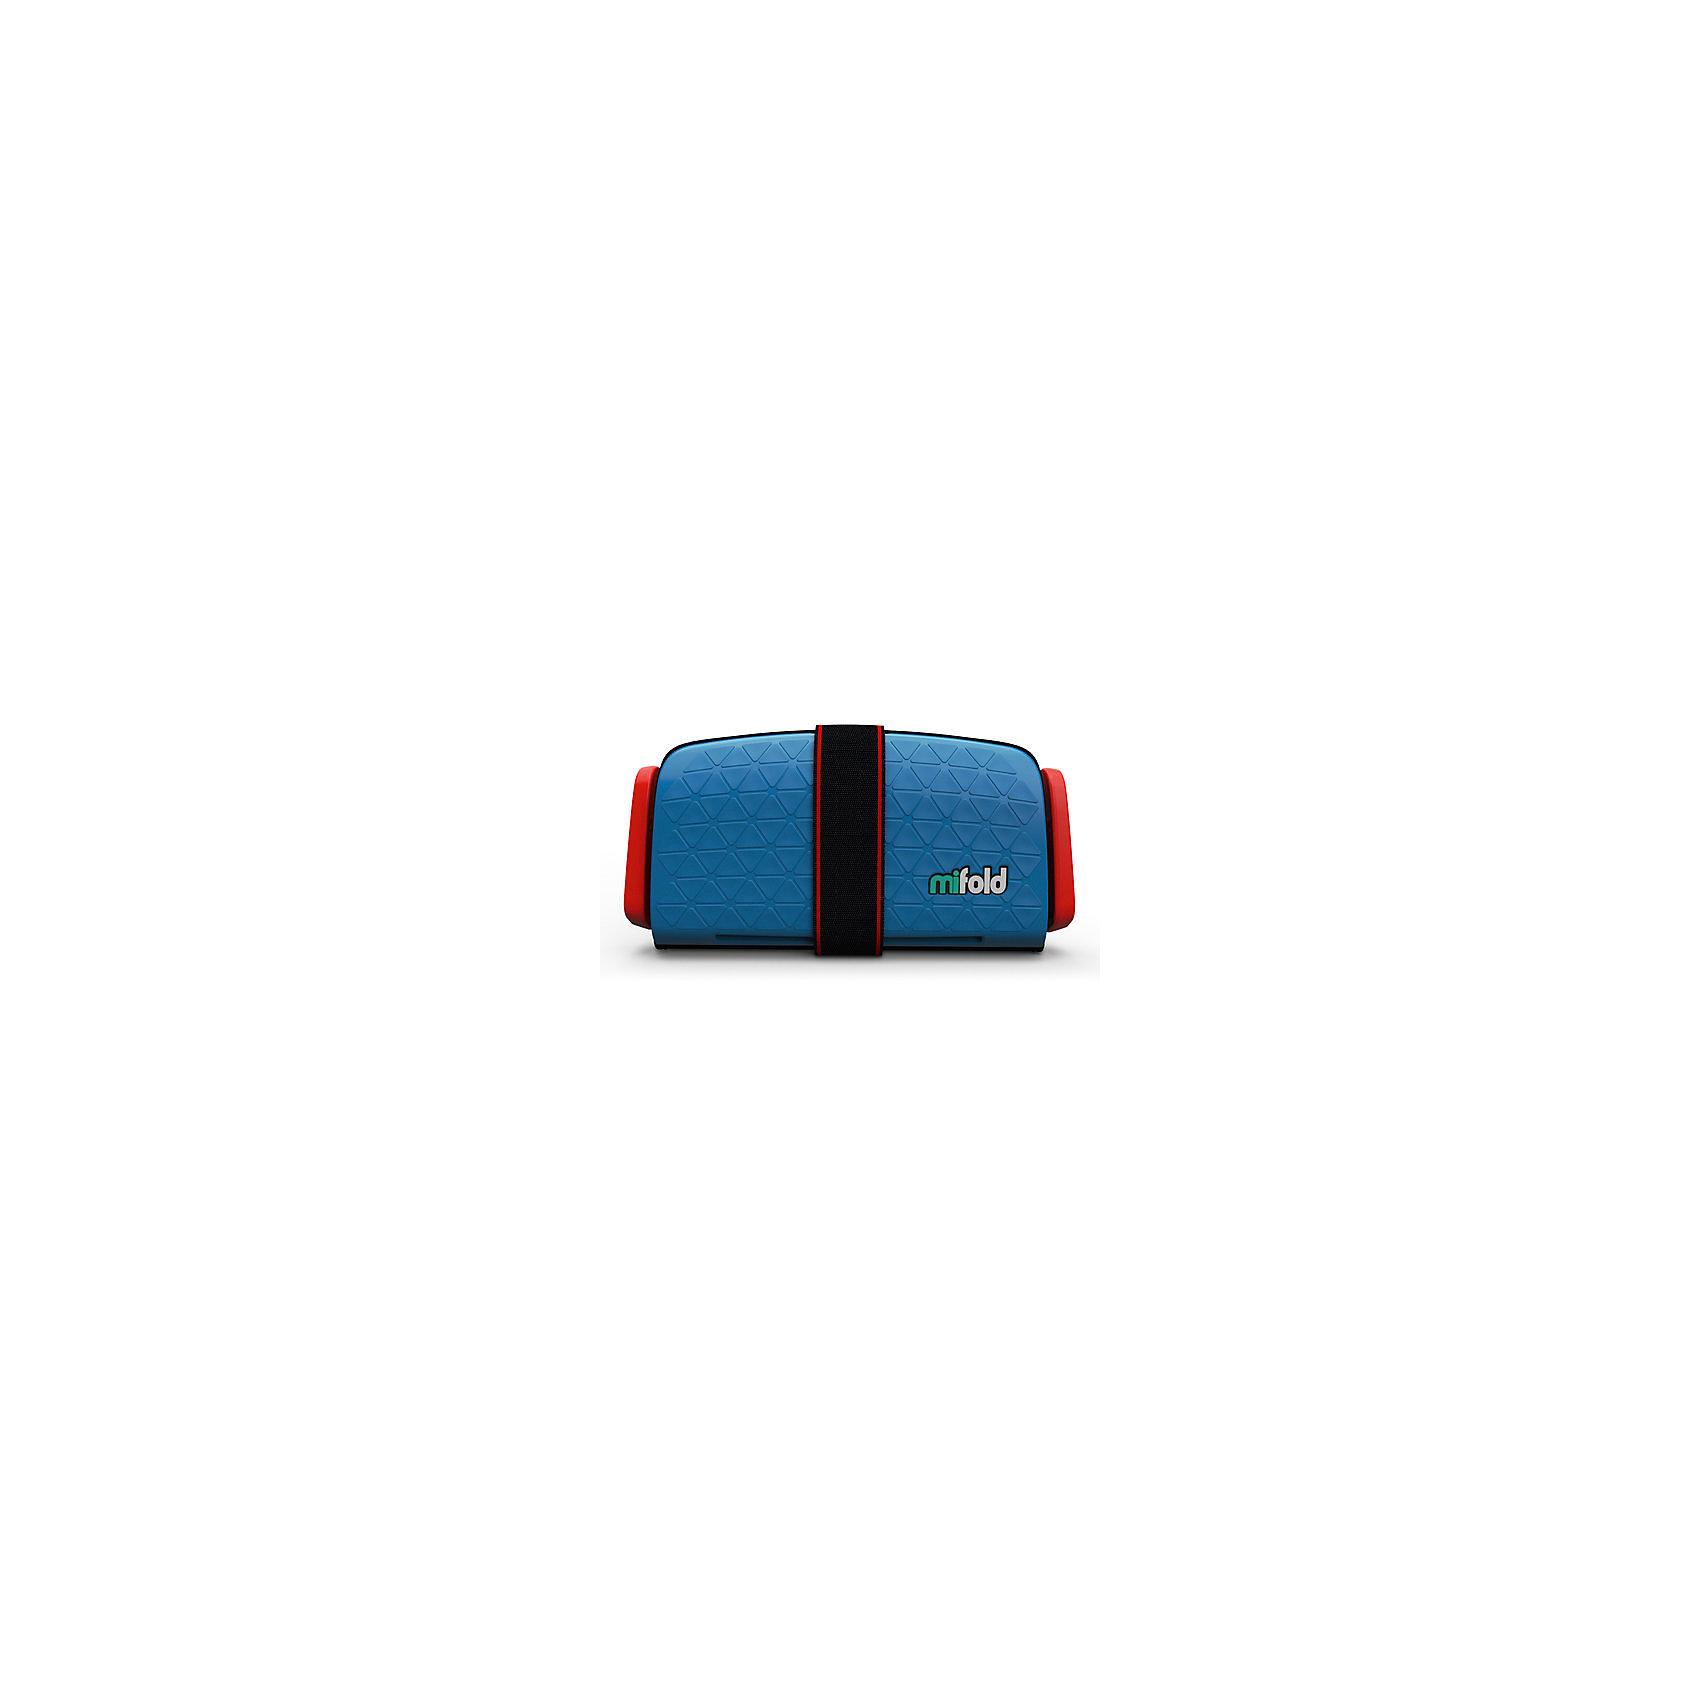 Автокресло-бустер Mifold 15-36 кг, denim blueБустеры<br>Бустер автомобильный Mifold - the Grab-and-Go Booster seat/Denim Blue<br><br>Ширина мм: 165<br>Глубина мм: 250<br>Высота мм: 70<br>Вес г: 950<br>Цвет: голубой<br>Возраст от месяцев: 48<br>Возраст до месяцев: 144<br>Пол: Унисекс<br>Возраст: Детский<br>SKU: 6878752